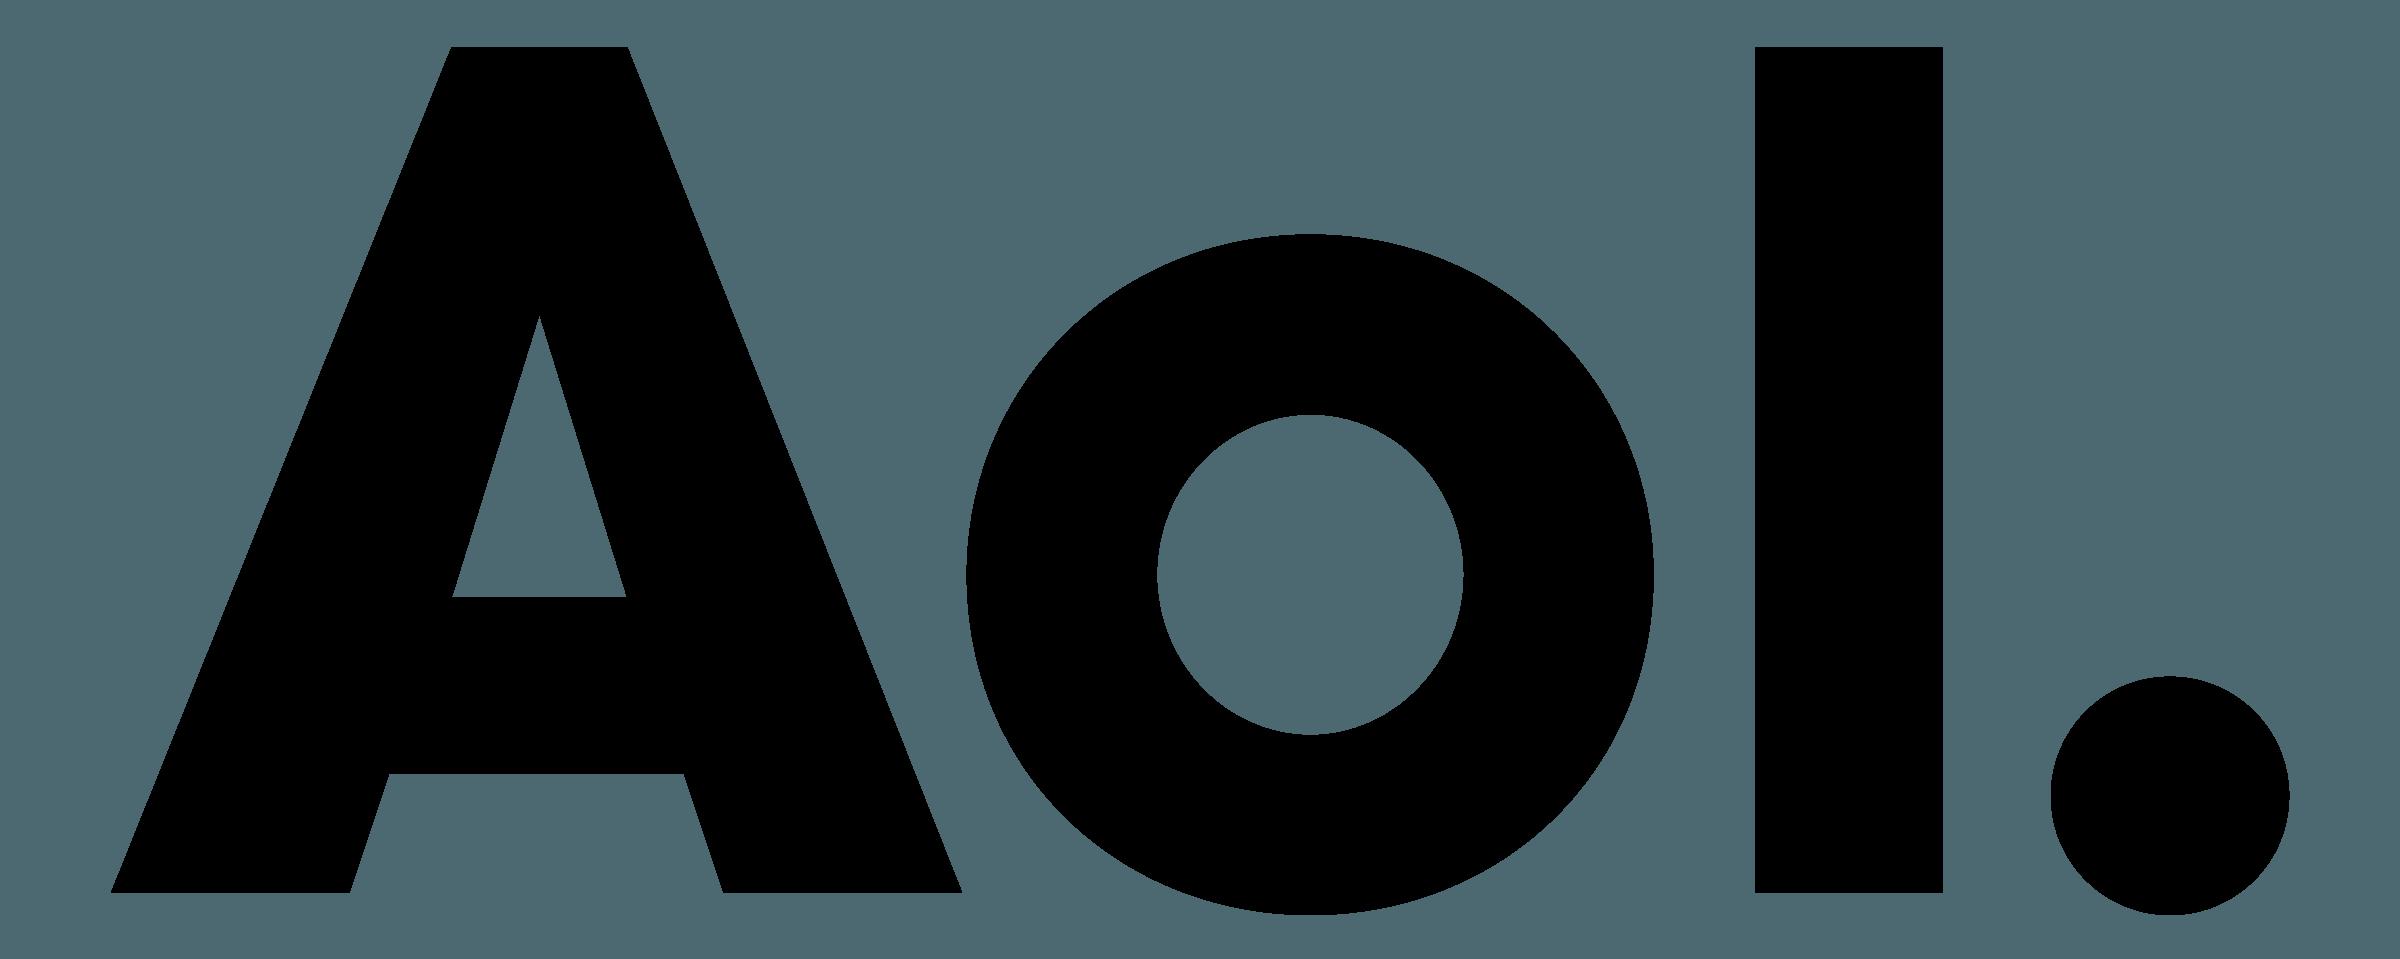 AOL Logo PNG Transparent & SVG Vector